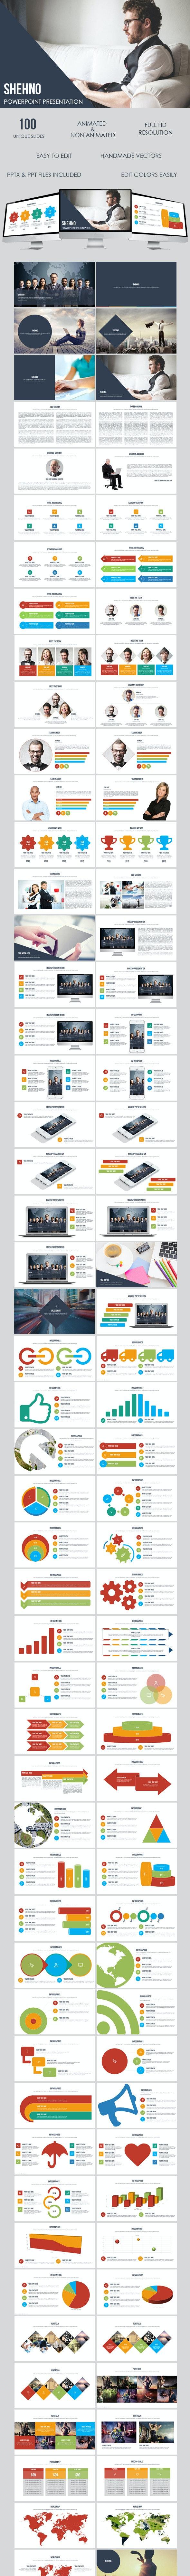 Shehno - Multipurpose Presentation Template - Business PowerPoint Templates